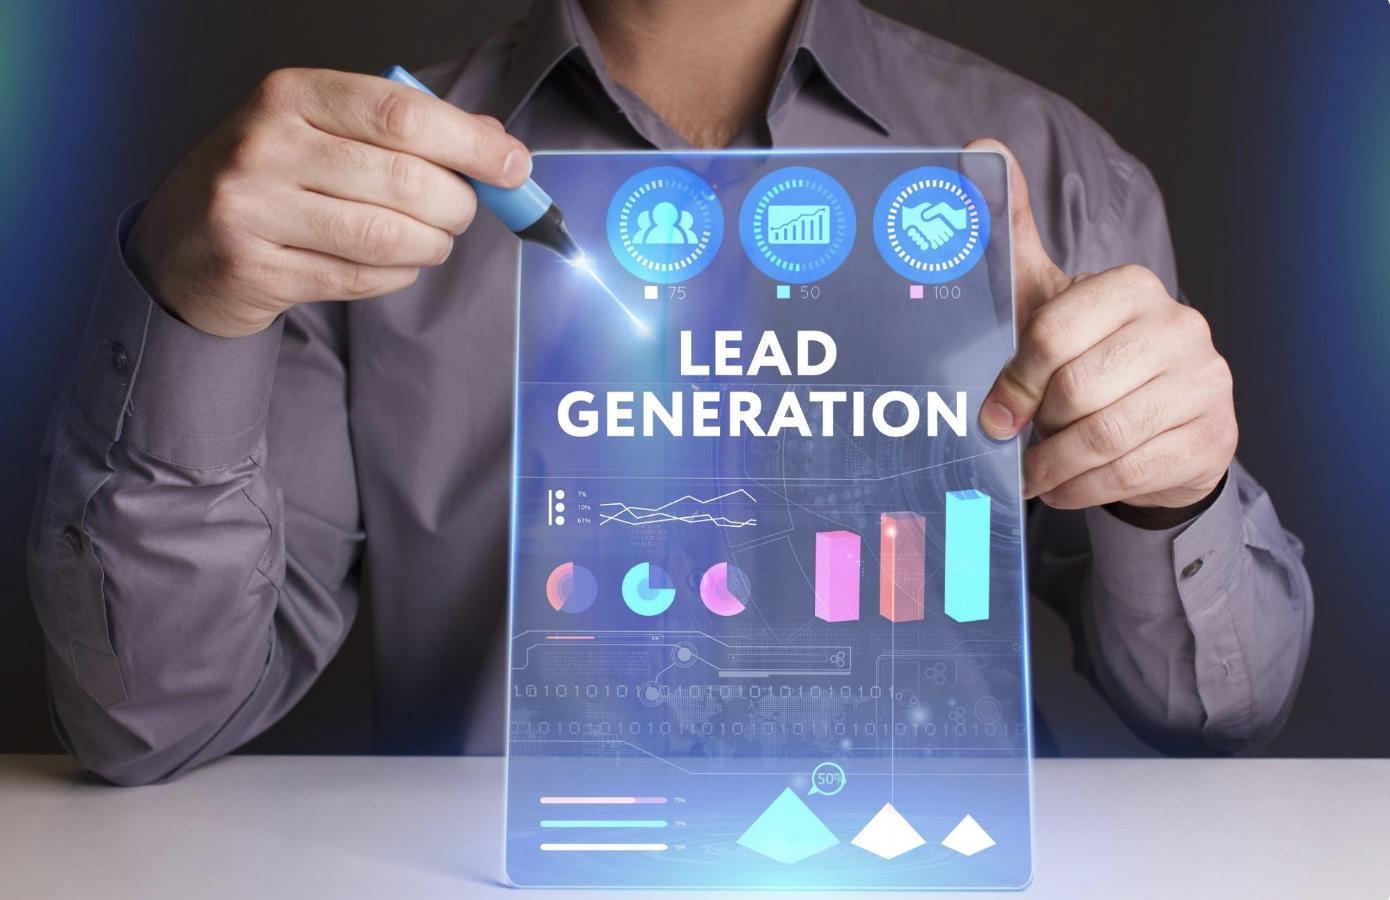 New Lead Generation Techniques